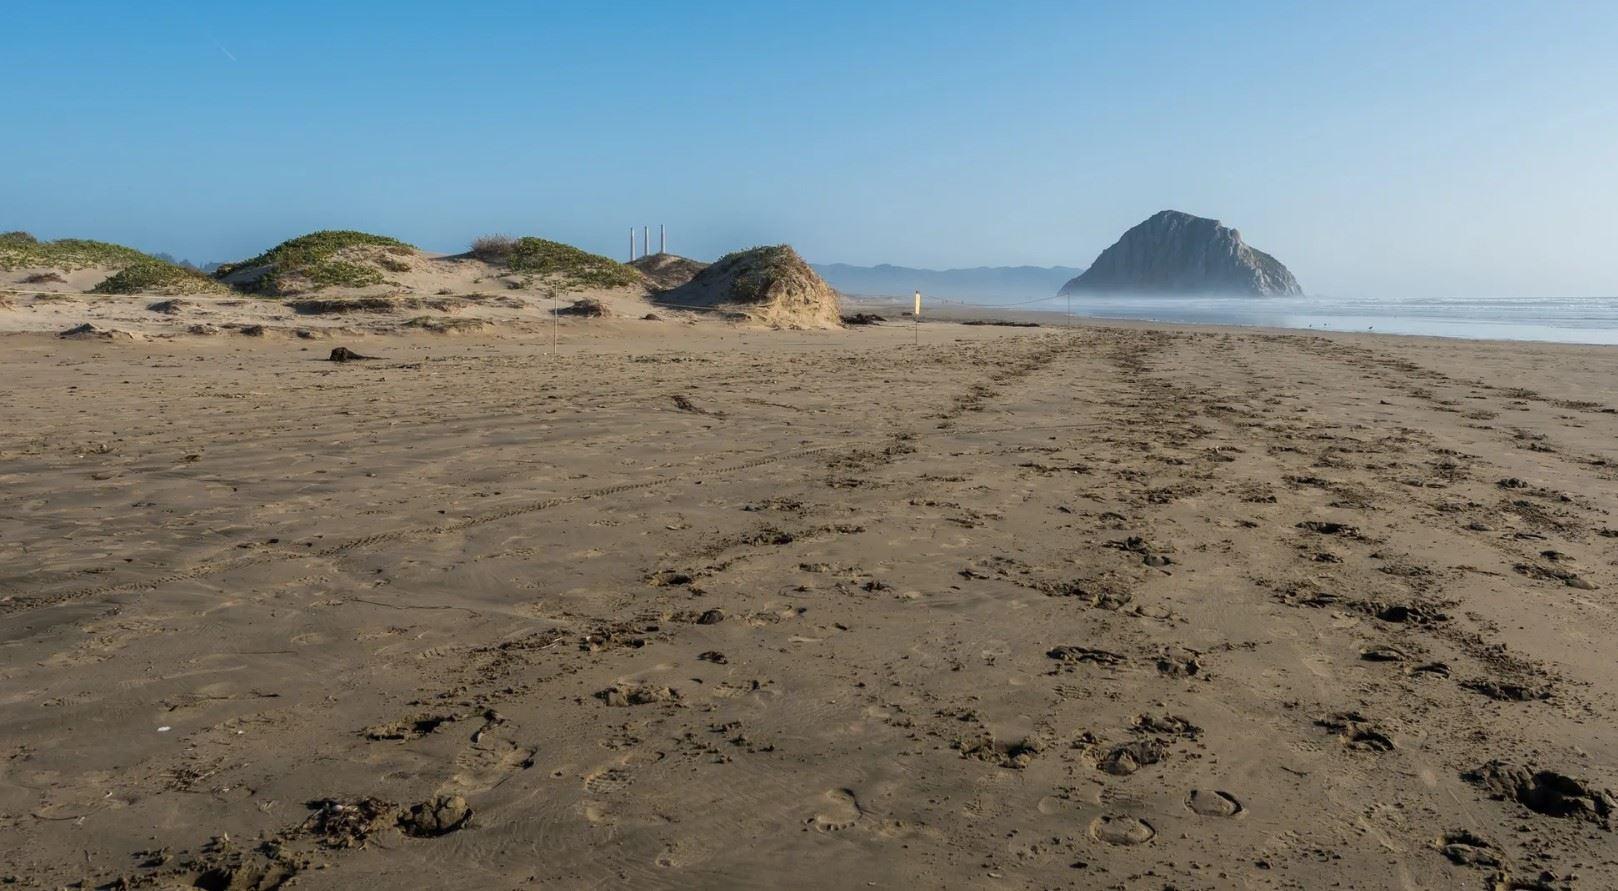 Morro Bay Rock Revival - Exterior - Local Beach Scene